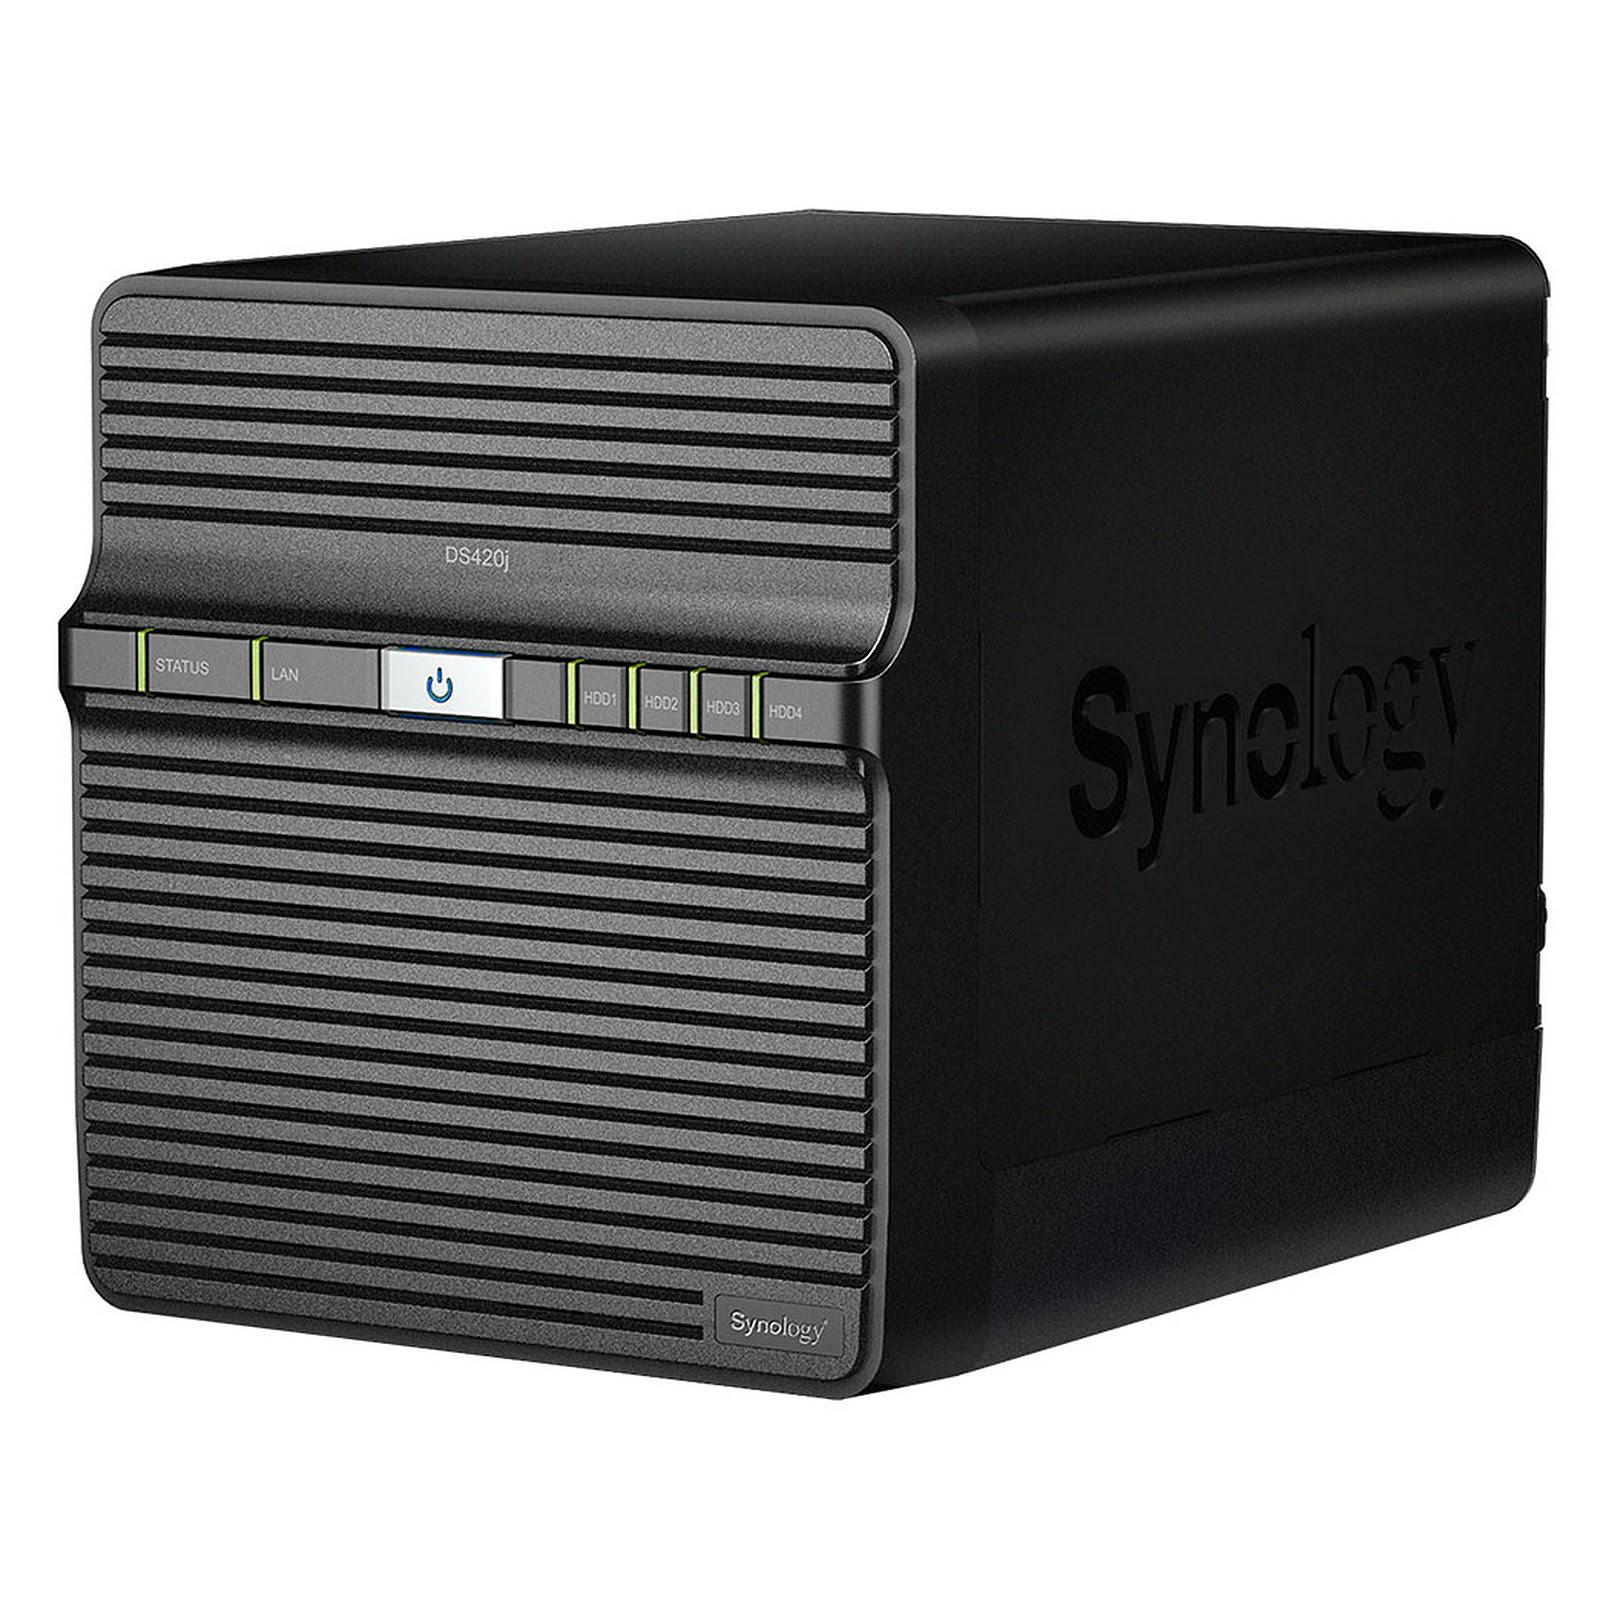 Synology DS420J - 4 HDD - Serveur NAS Synology - Cybertek.fr - 3